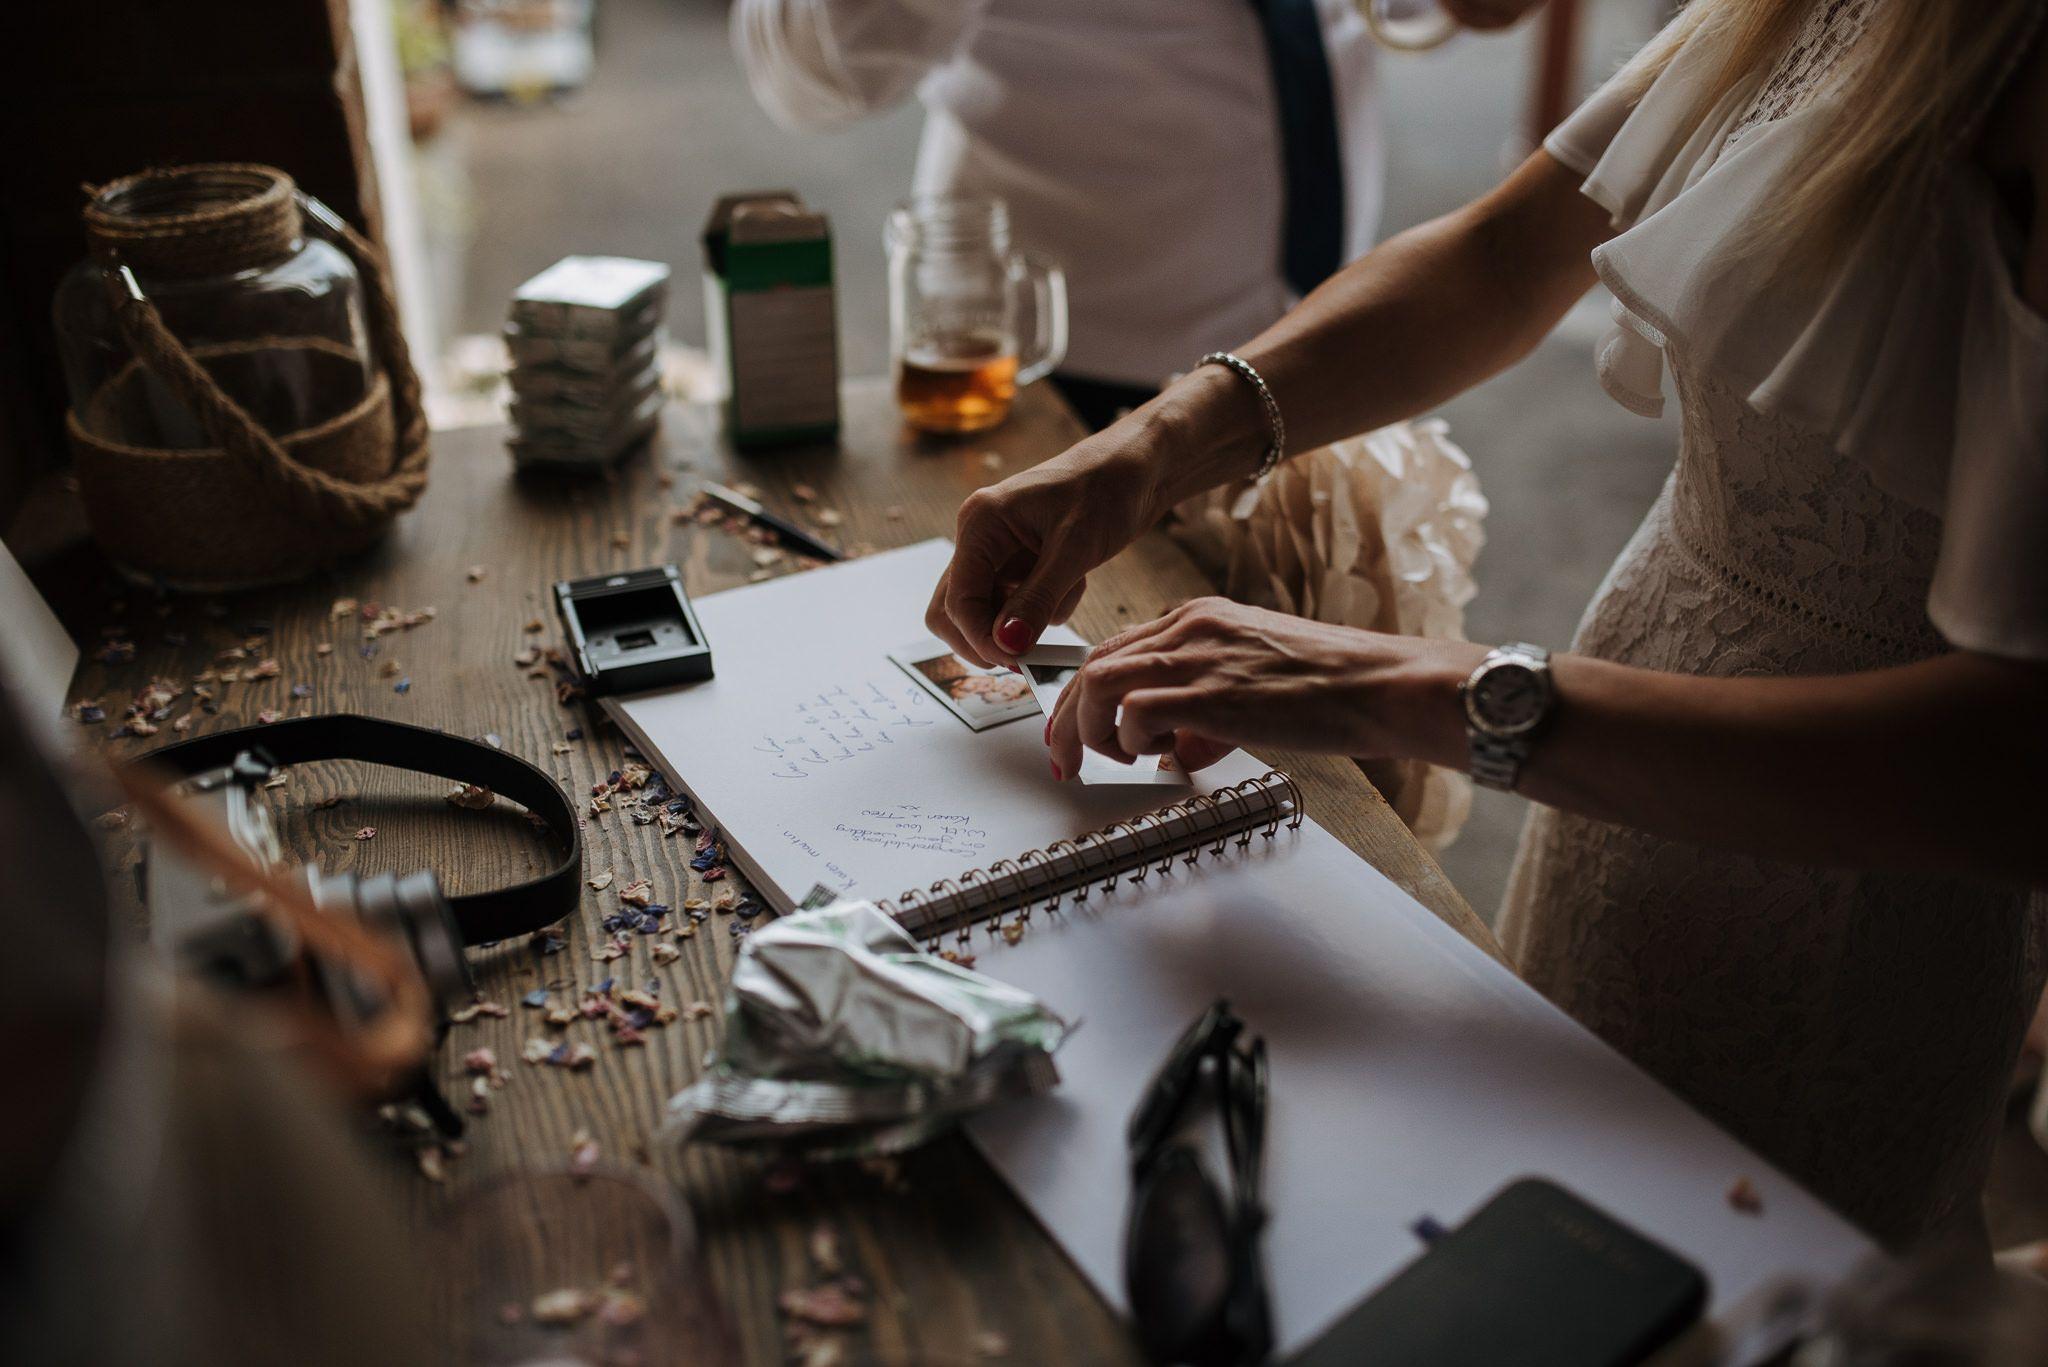 lincolnshire-wedding-photographer-1.jpg